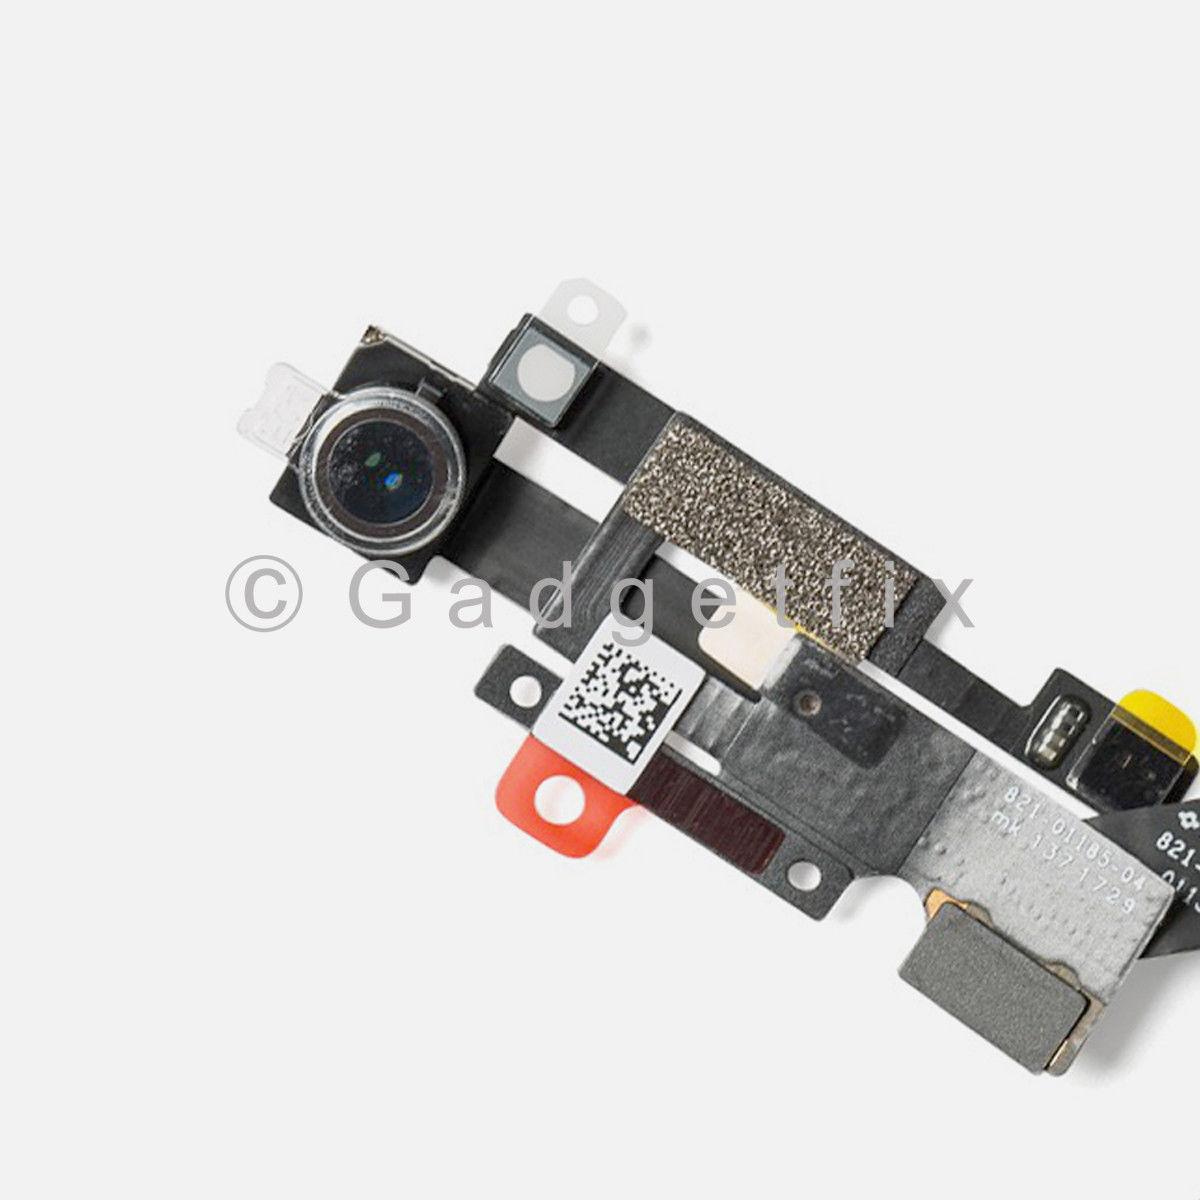 Proximity Sensor Cable : Us new front facing camera module proximity light sensor